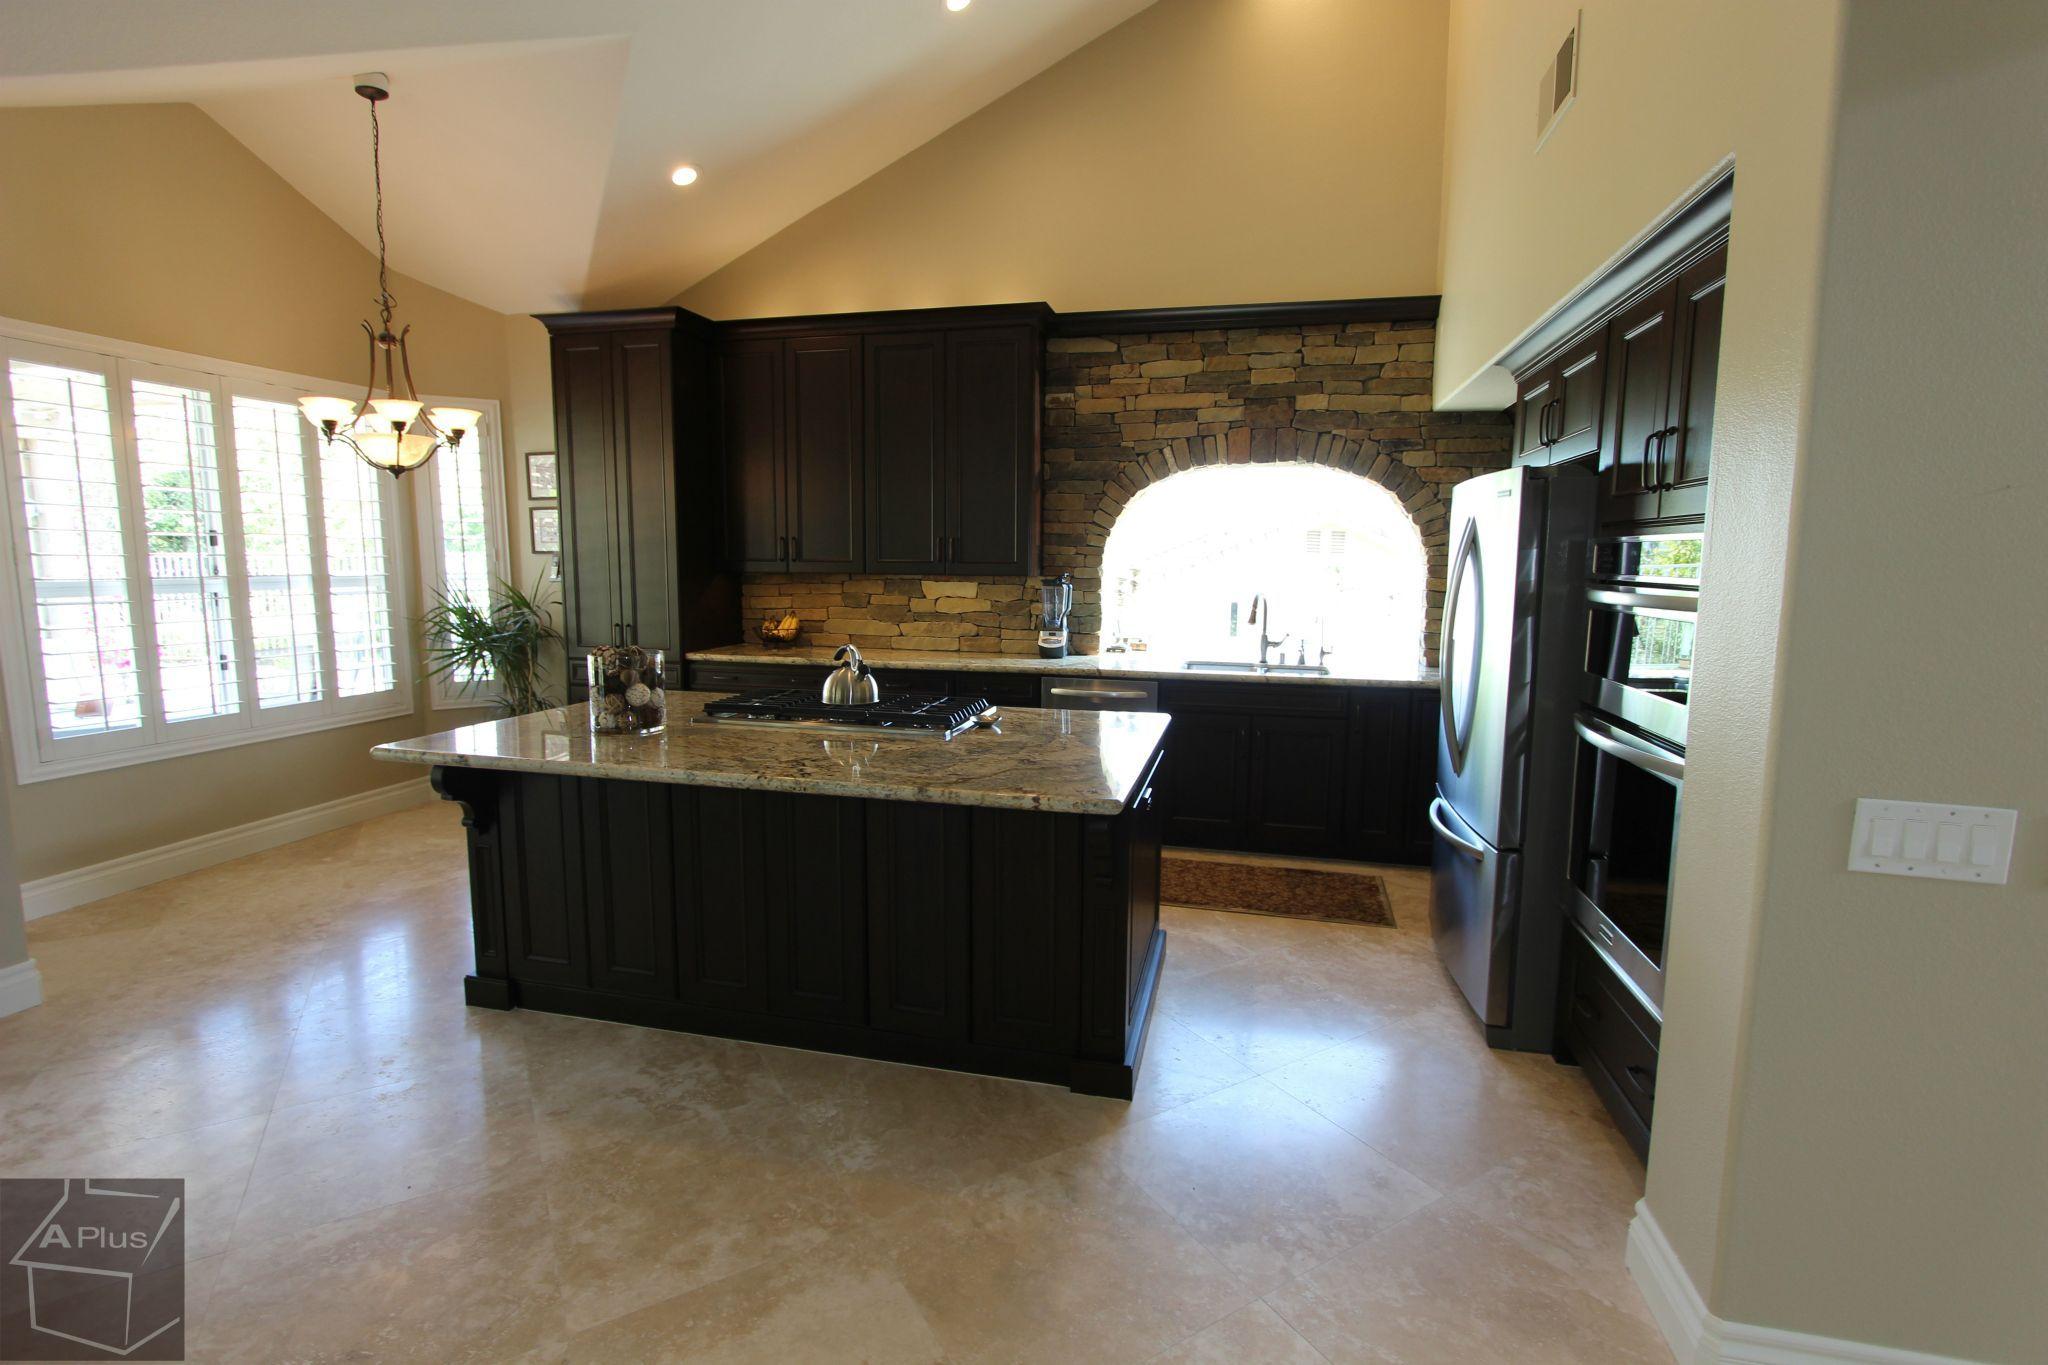 Design Build Traditional #kitchenRemodel With #CustomCabinets Brick Layer  Backsplash In Yorba Linda Orange County